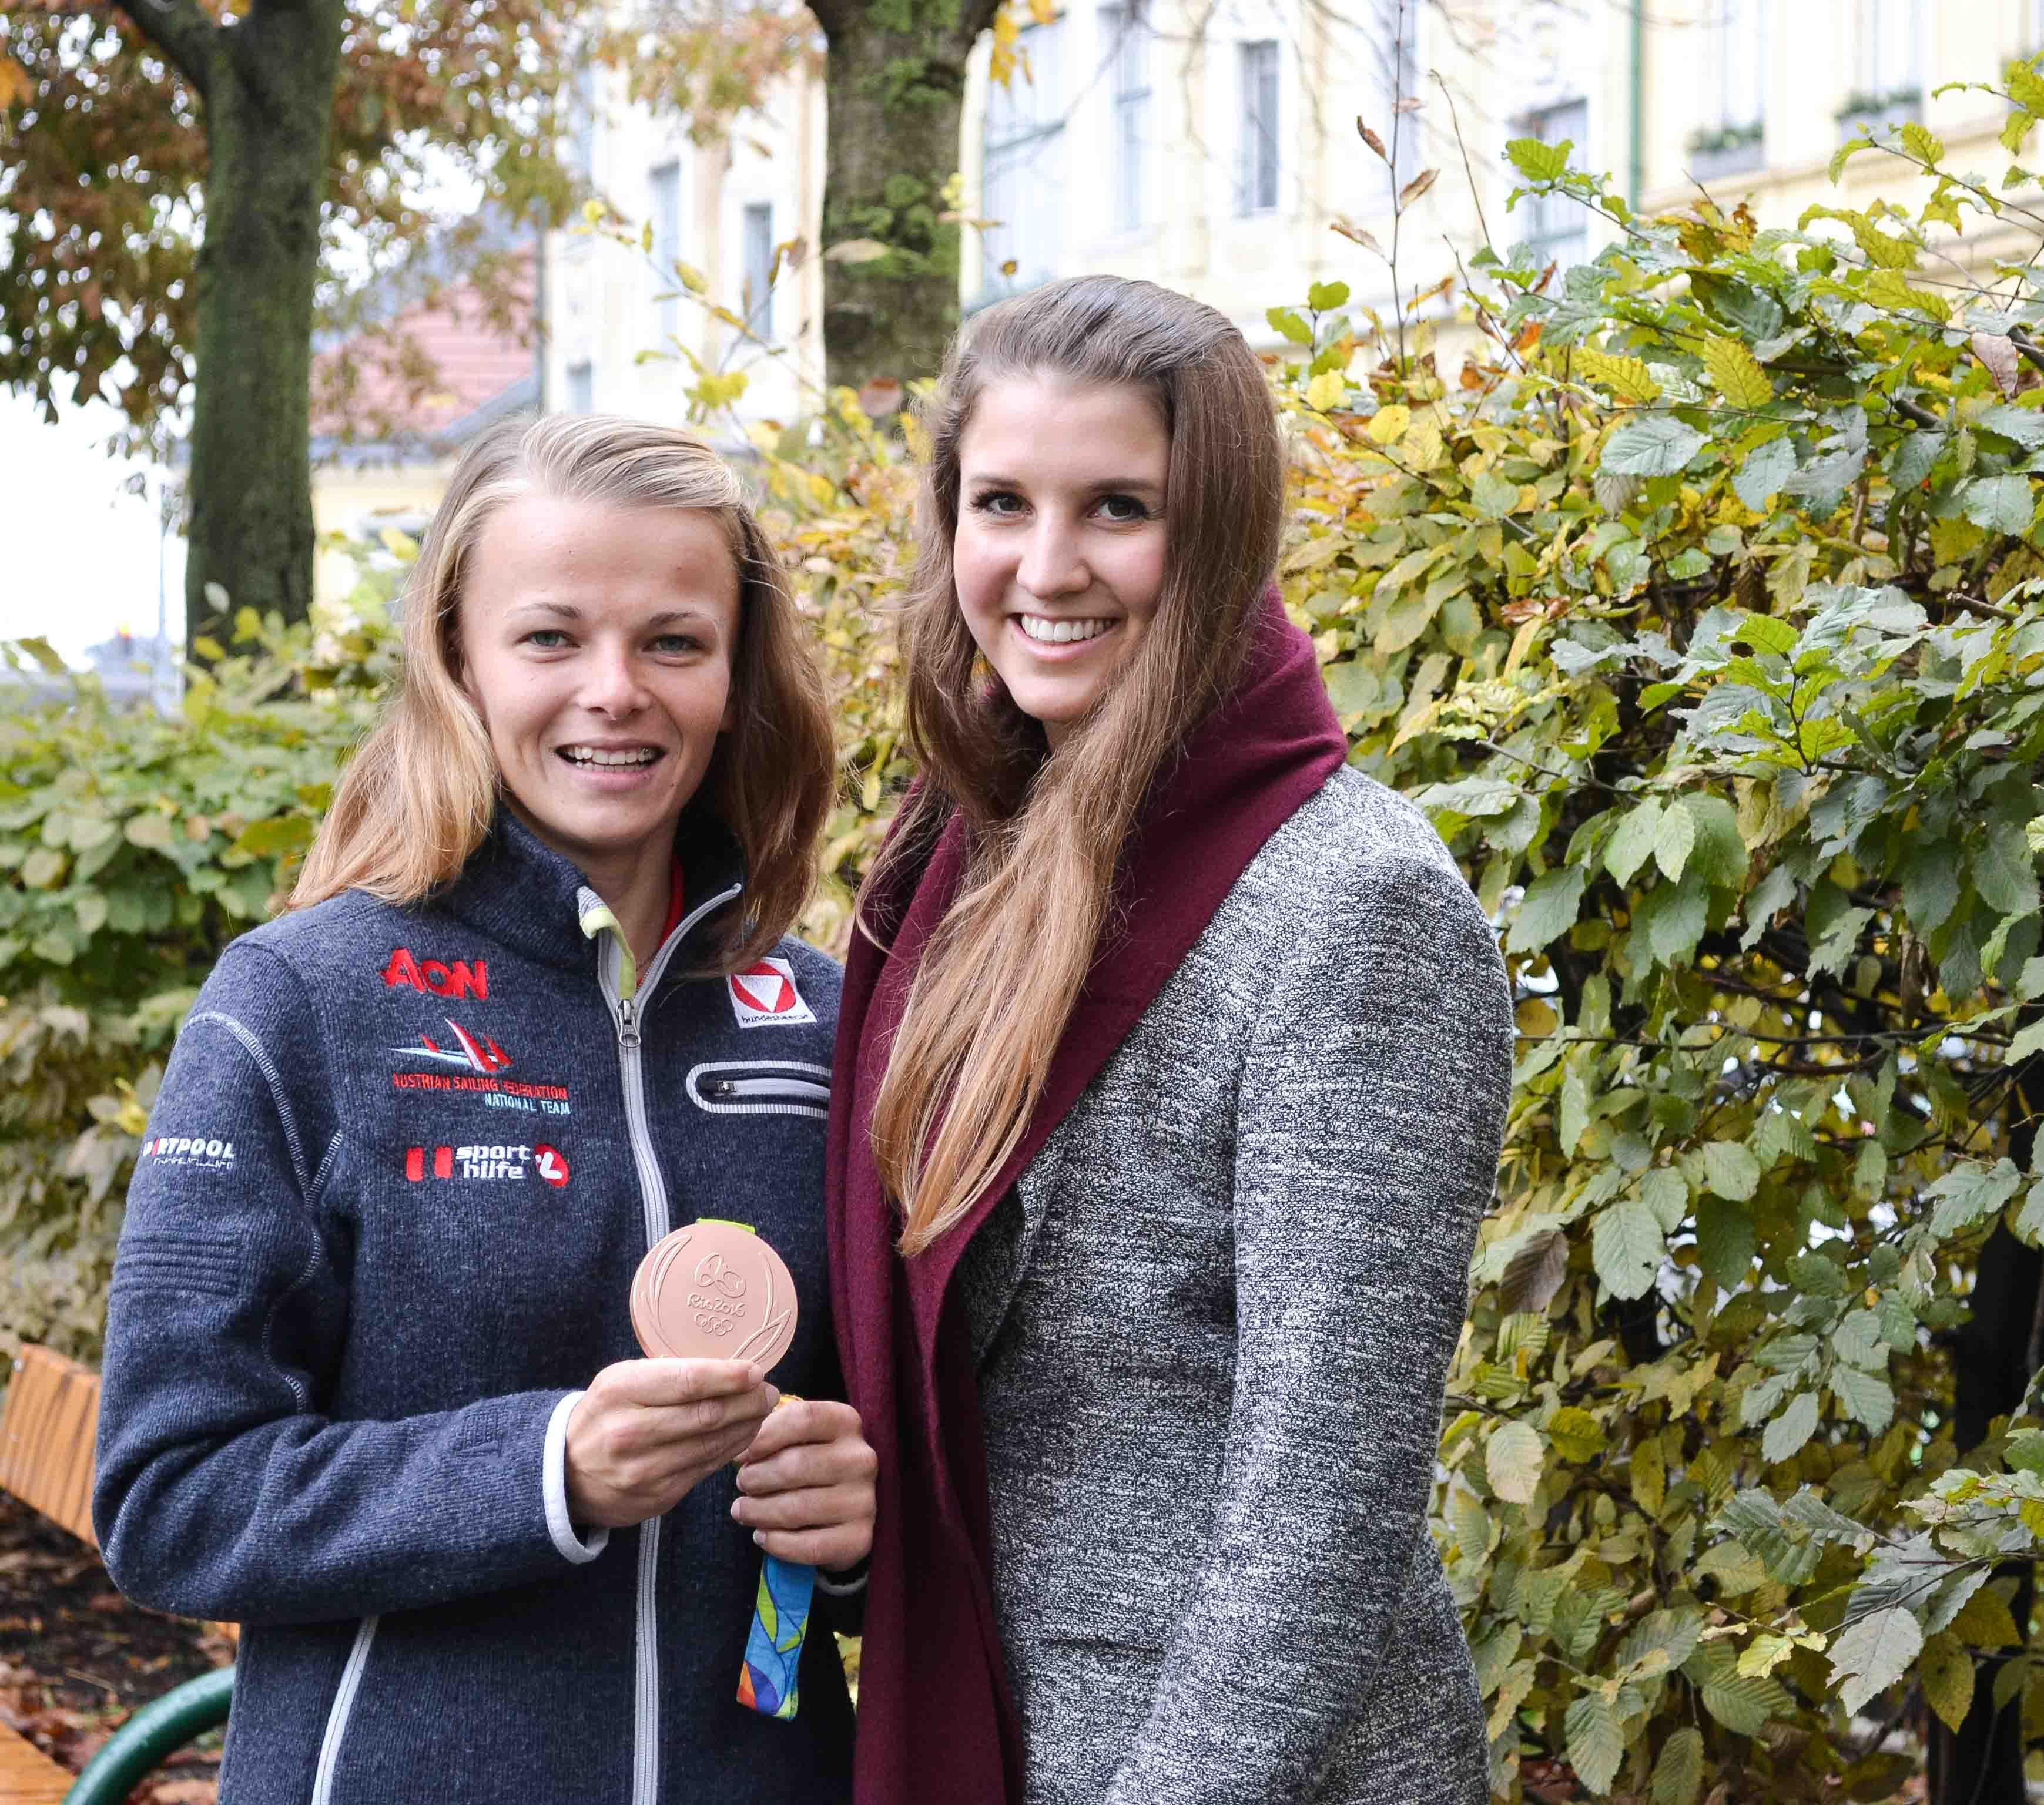 tanja-frank-interview-olympia-medaille-o%cc%88sterreich-klara-fuchs-fitnessblog-6